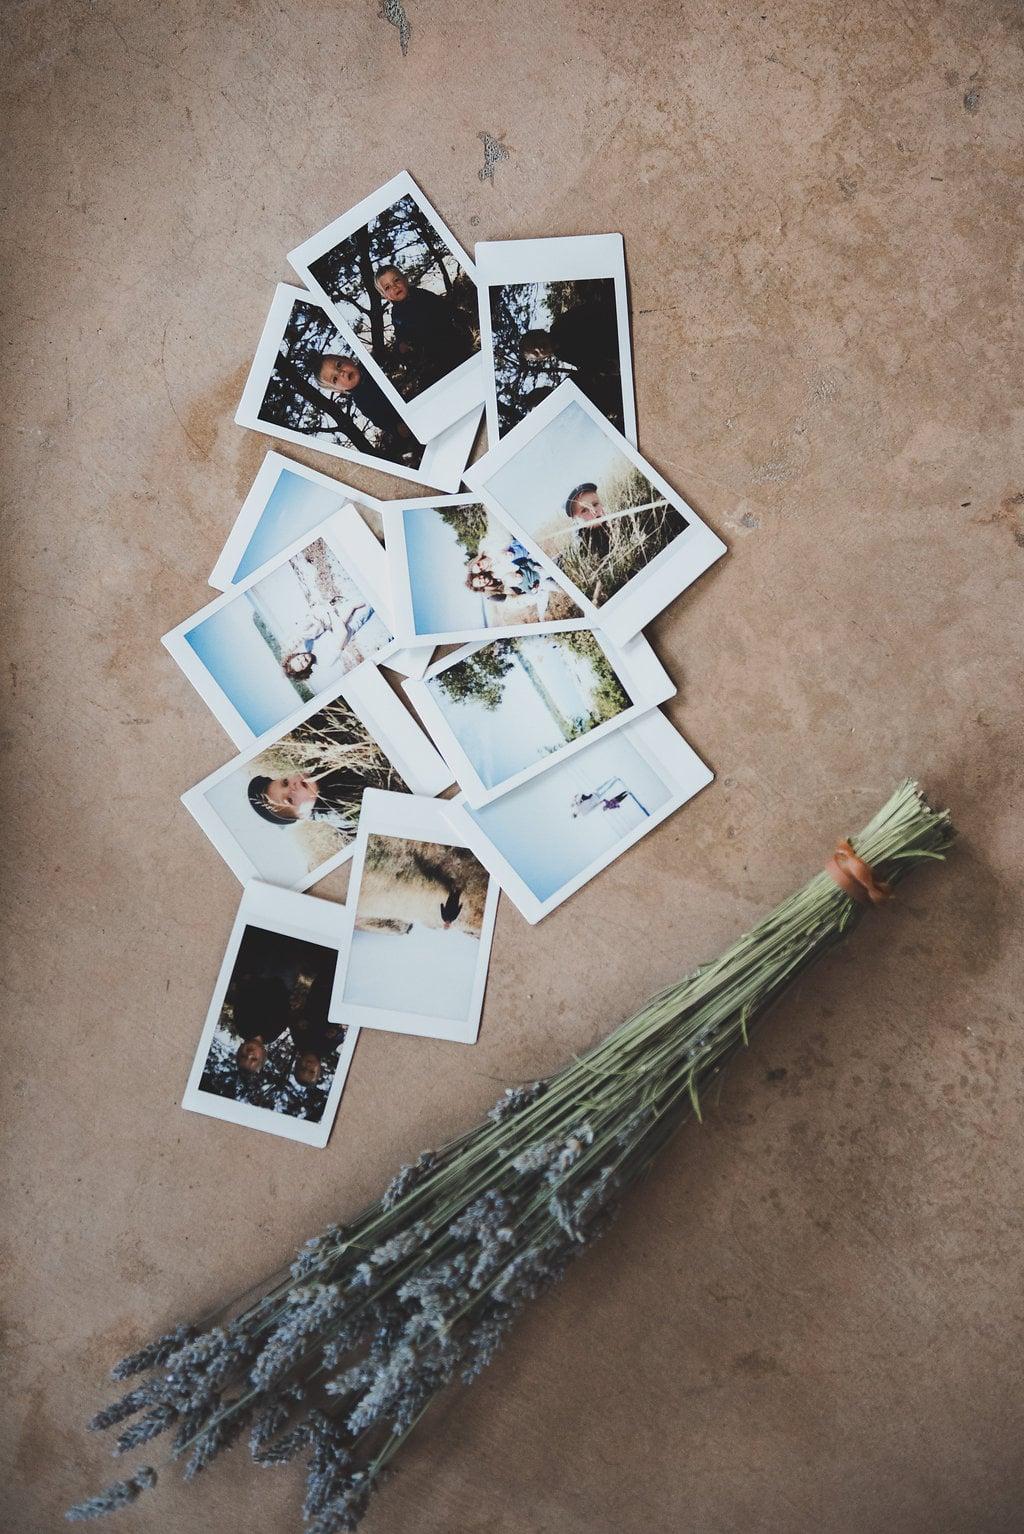 rebeccaamberphotography-9162.jpg